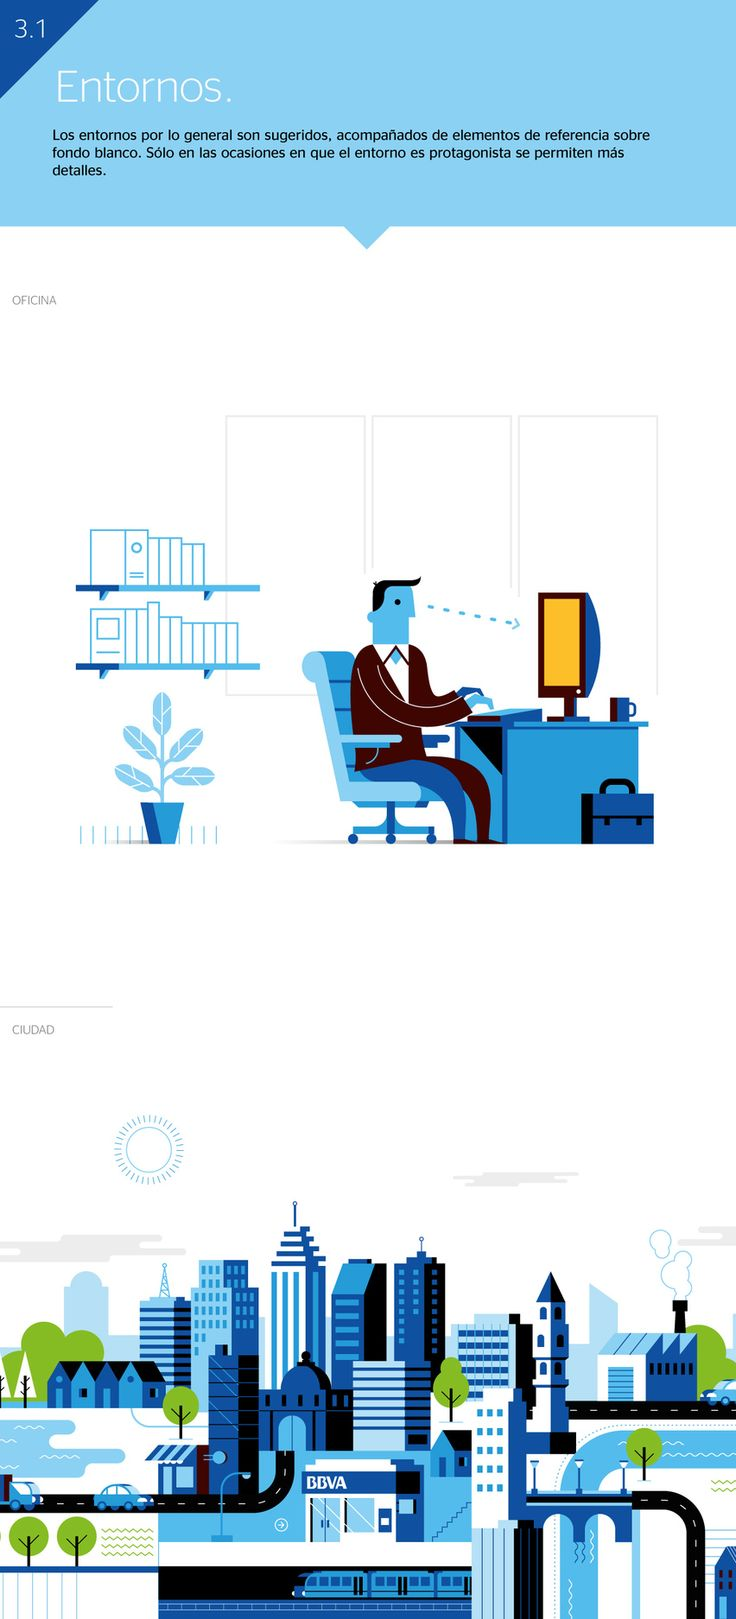 BBVA Ilustración Corporativa. 7